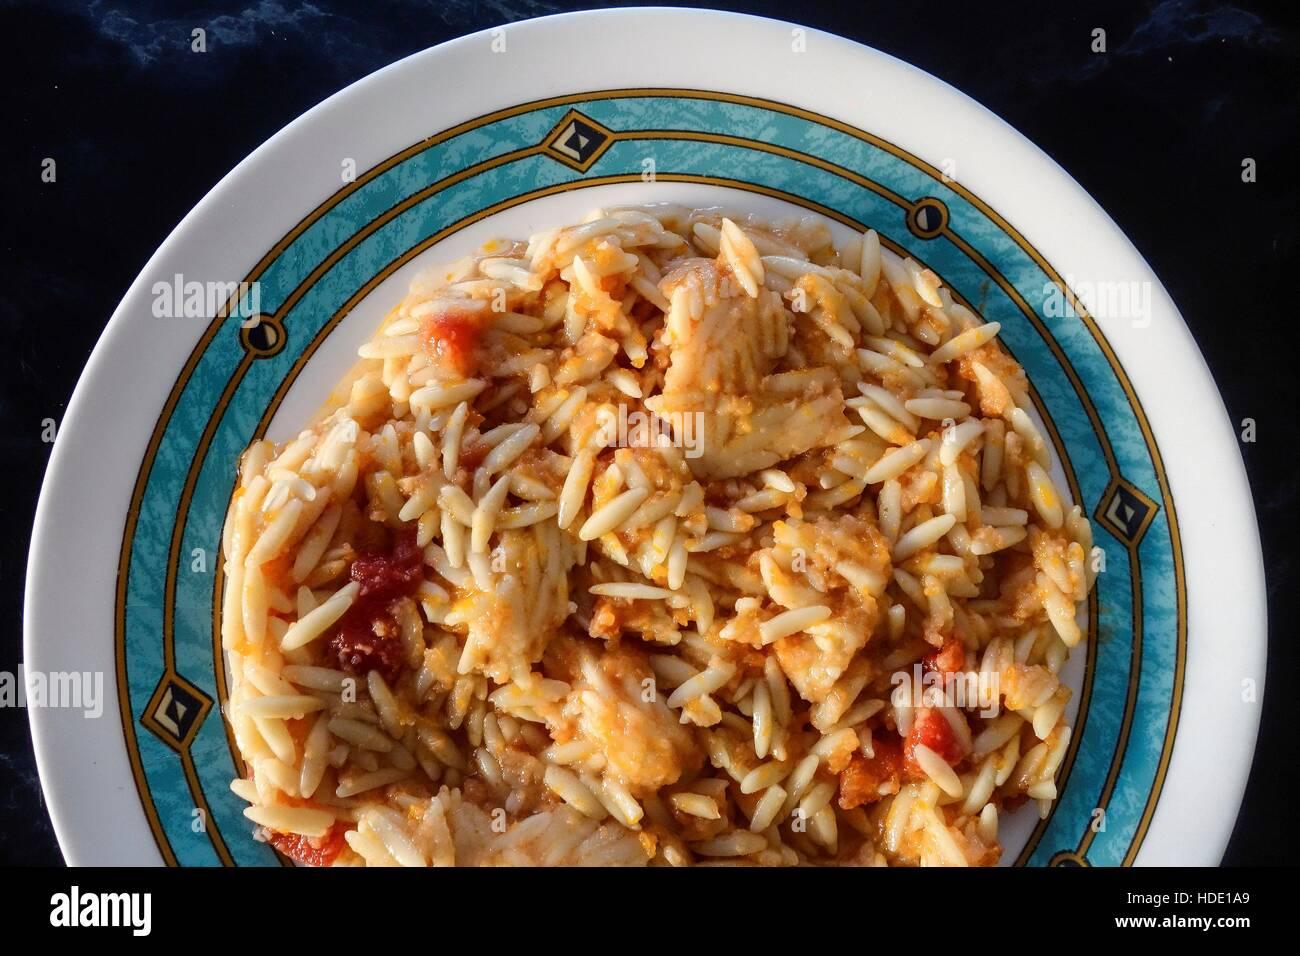 Griechische Küche. Kritharaki, Reis Nudeln Nudeln geformt Stockbild